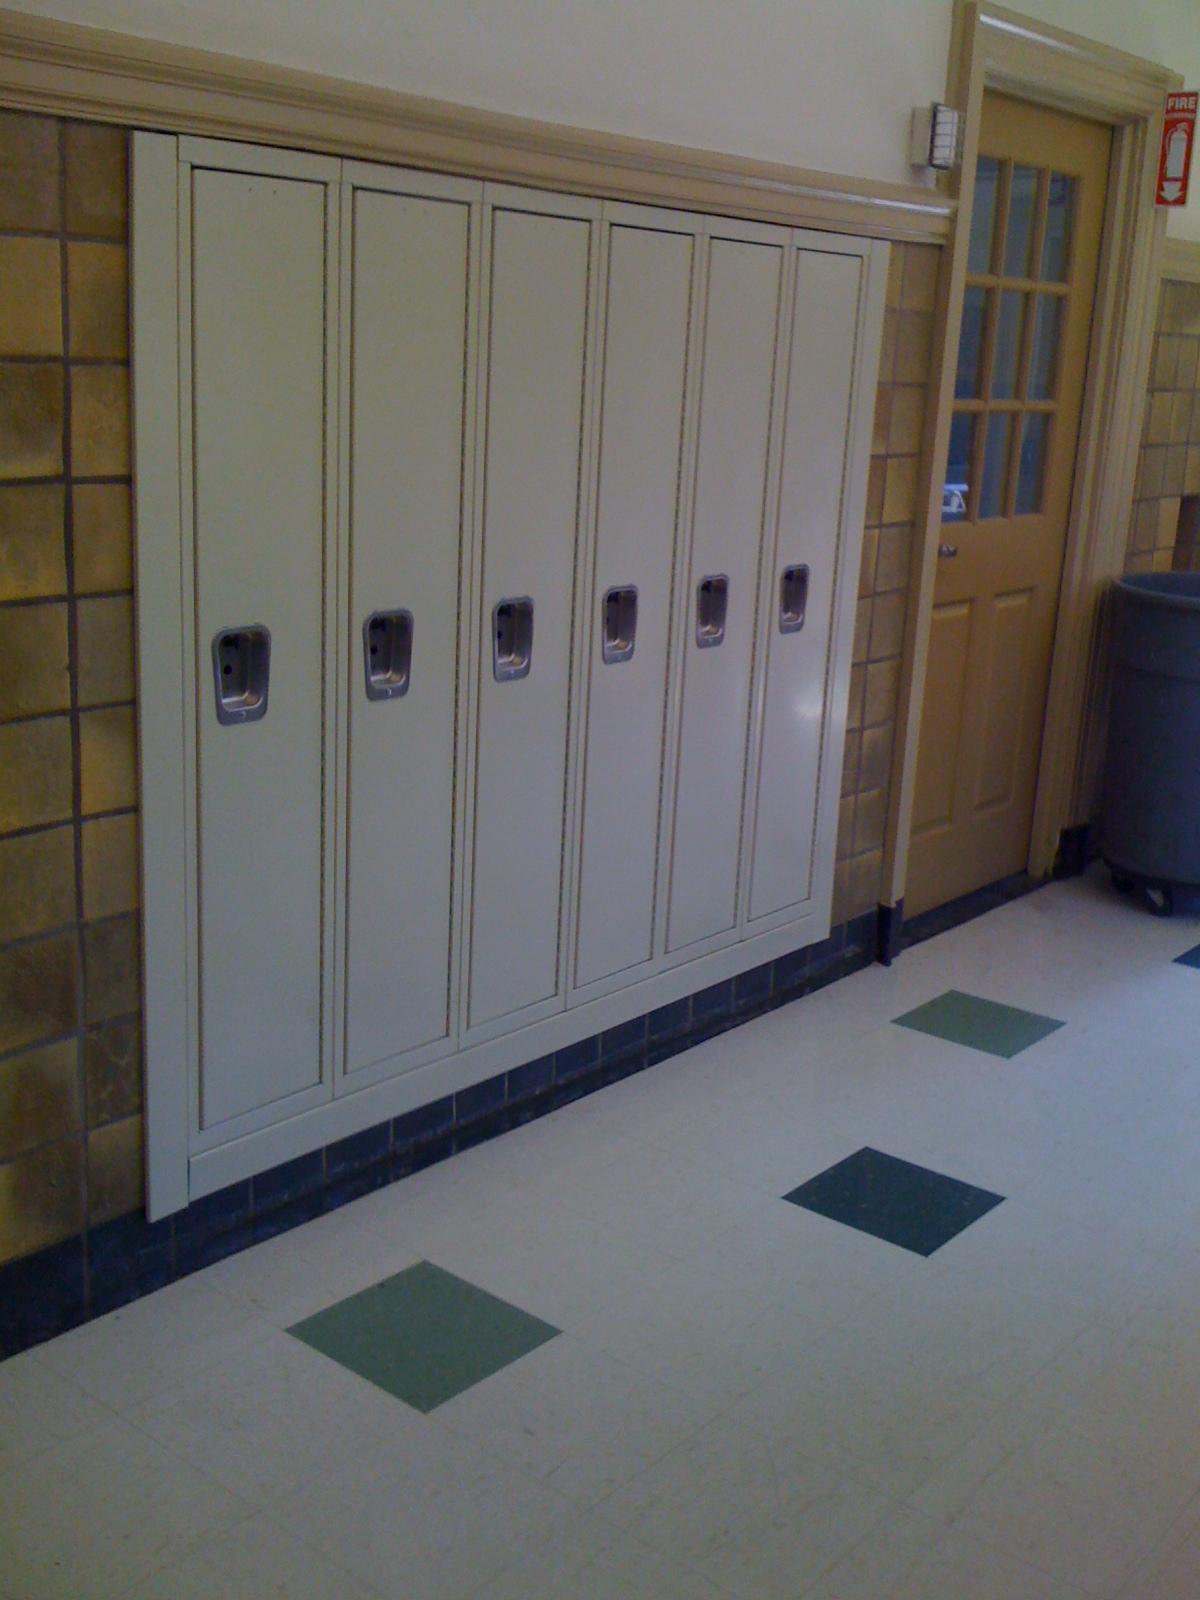 Oz Installation school lockers